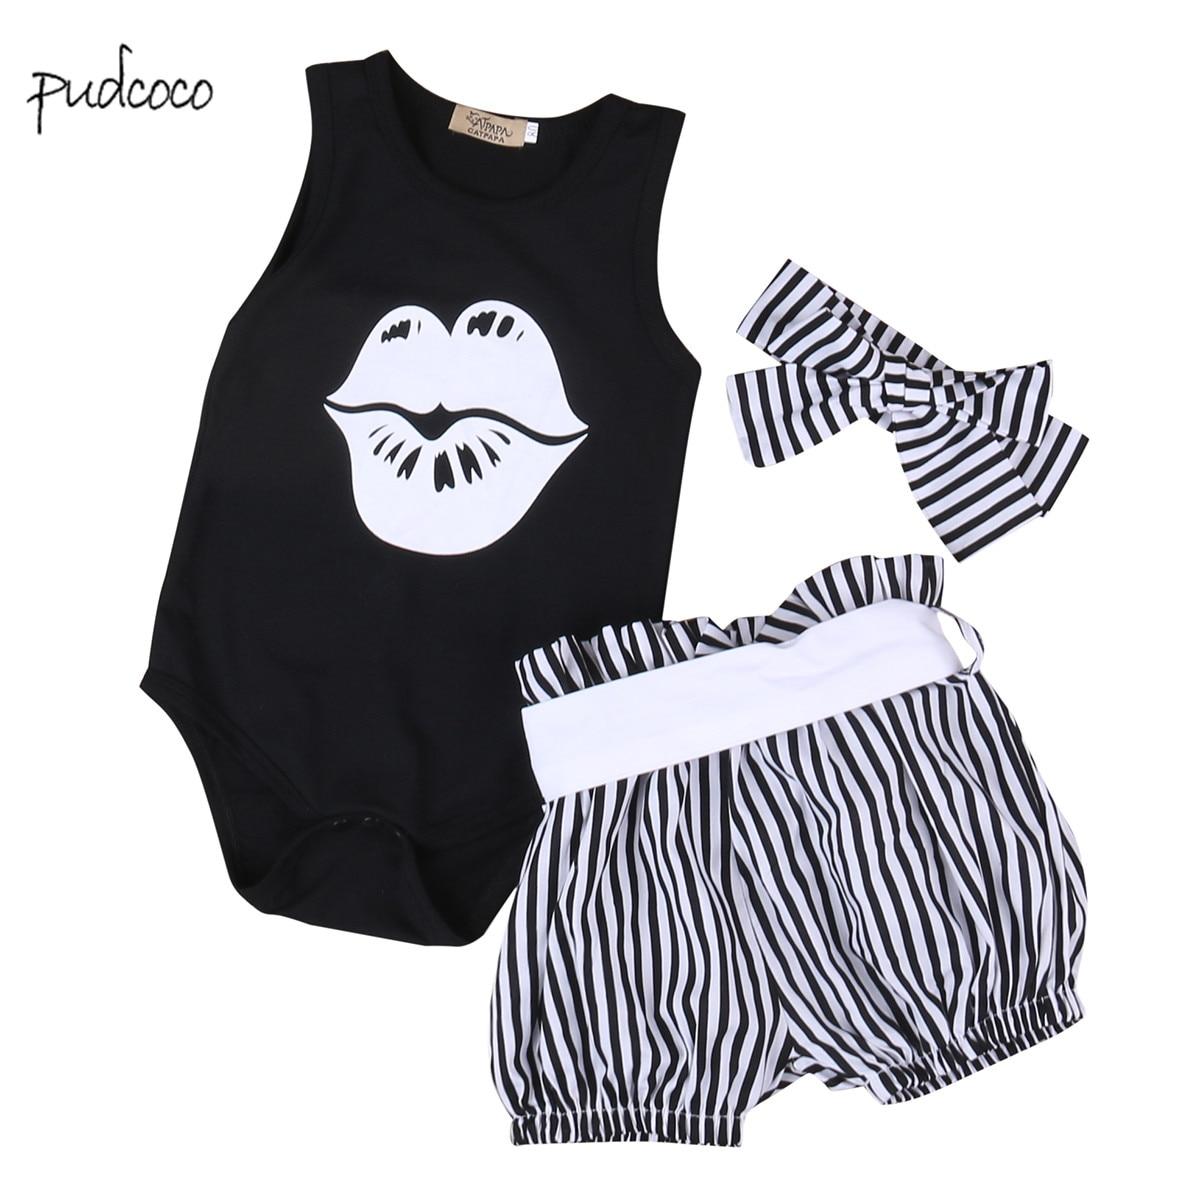 Pudcoco New Brand 3pcs Baby Boys Girls Short Sleeve Shirt + Striped  Shorts + Headband Outfit Set